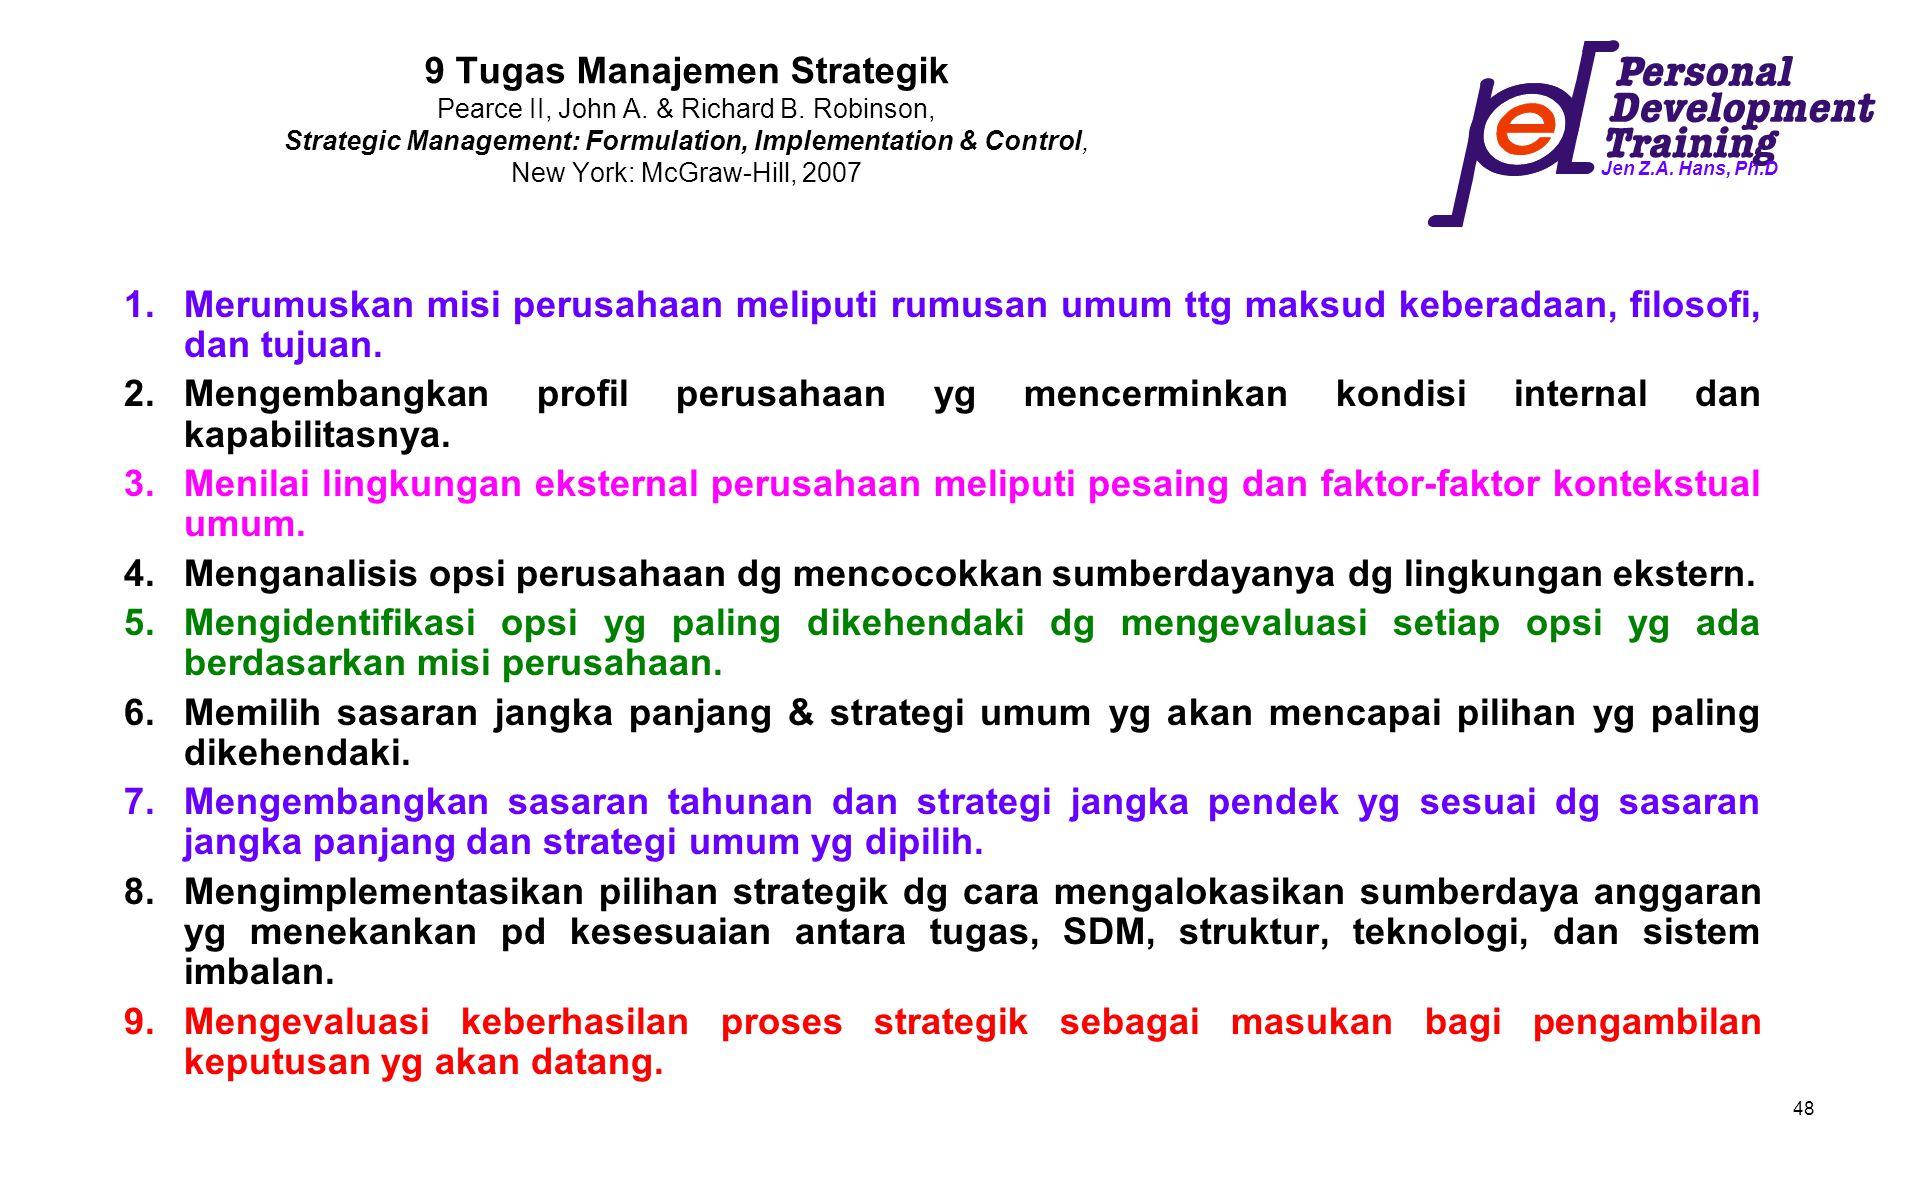 Jen Z.A. Hans, Ph.D 48 9 Tugas Manajemen Strategik Pearce II, John A. & Richard B. Robinson, Strategic Management: Formulation, Implementation & Contr